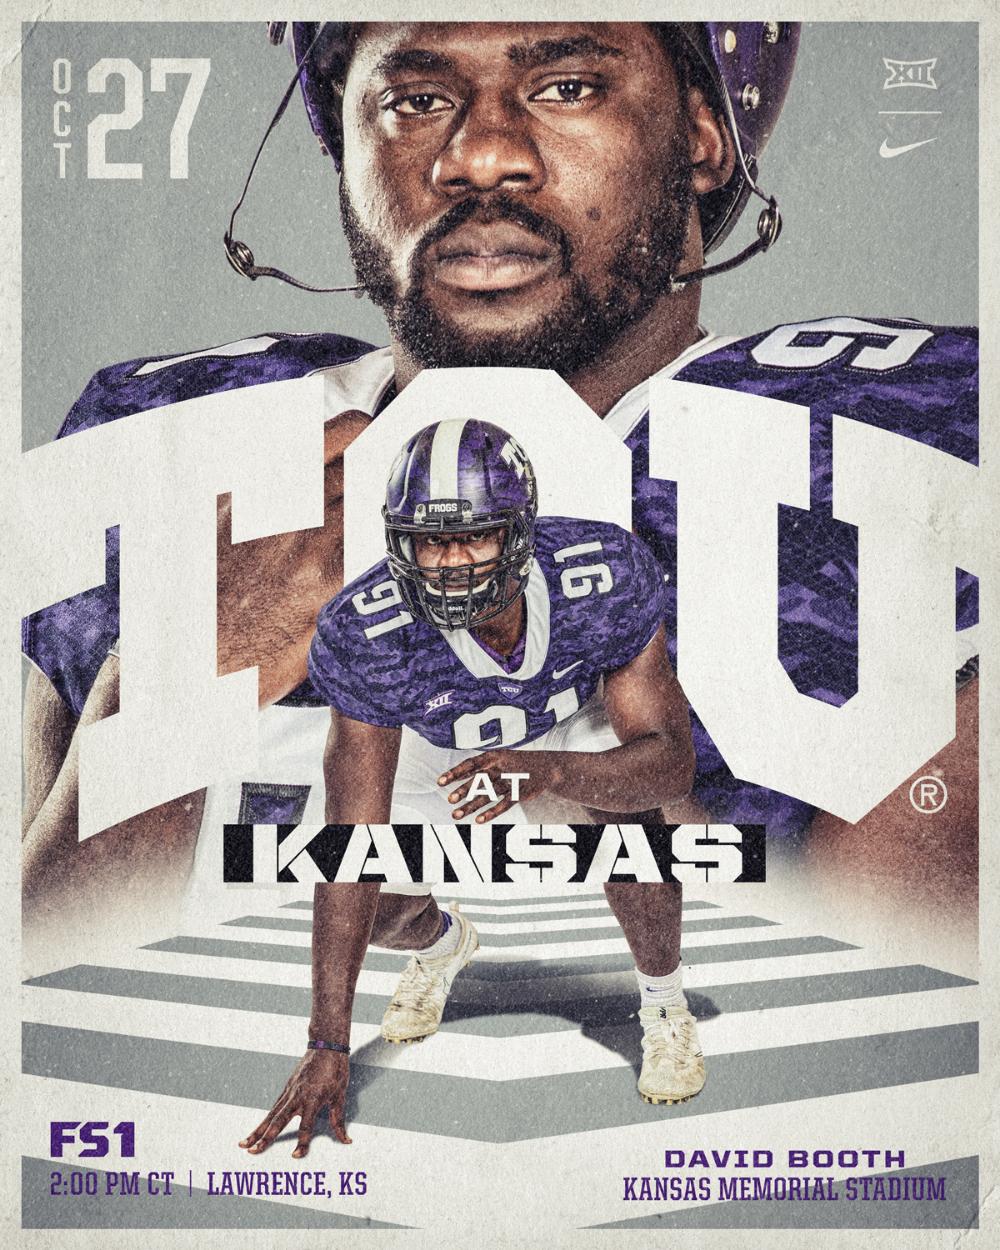 2018 Tcu Football Social Graphics On Behance Tcu Football Sports Graphics Football